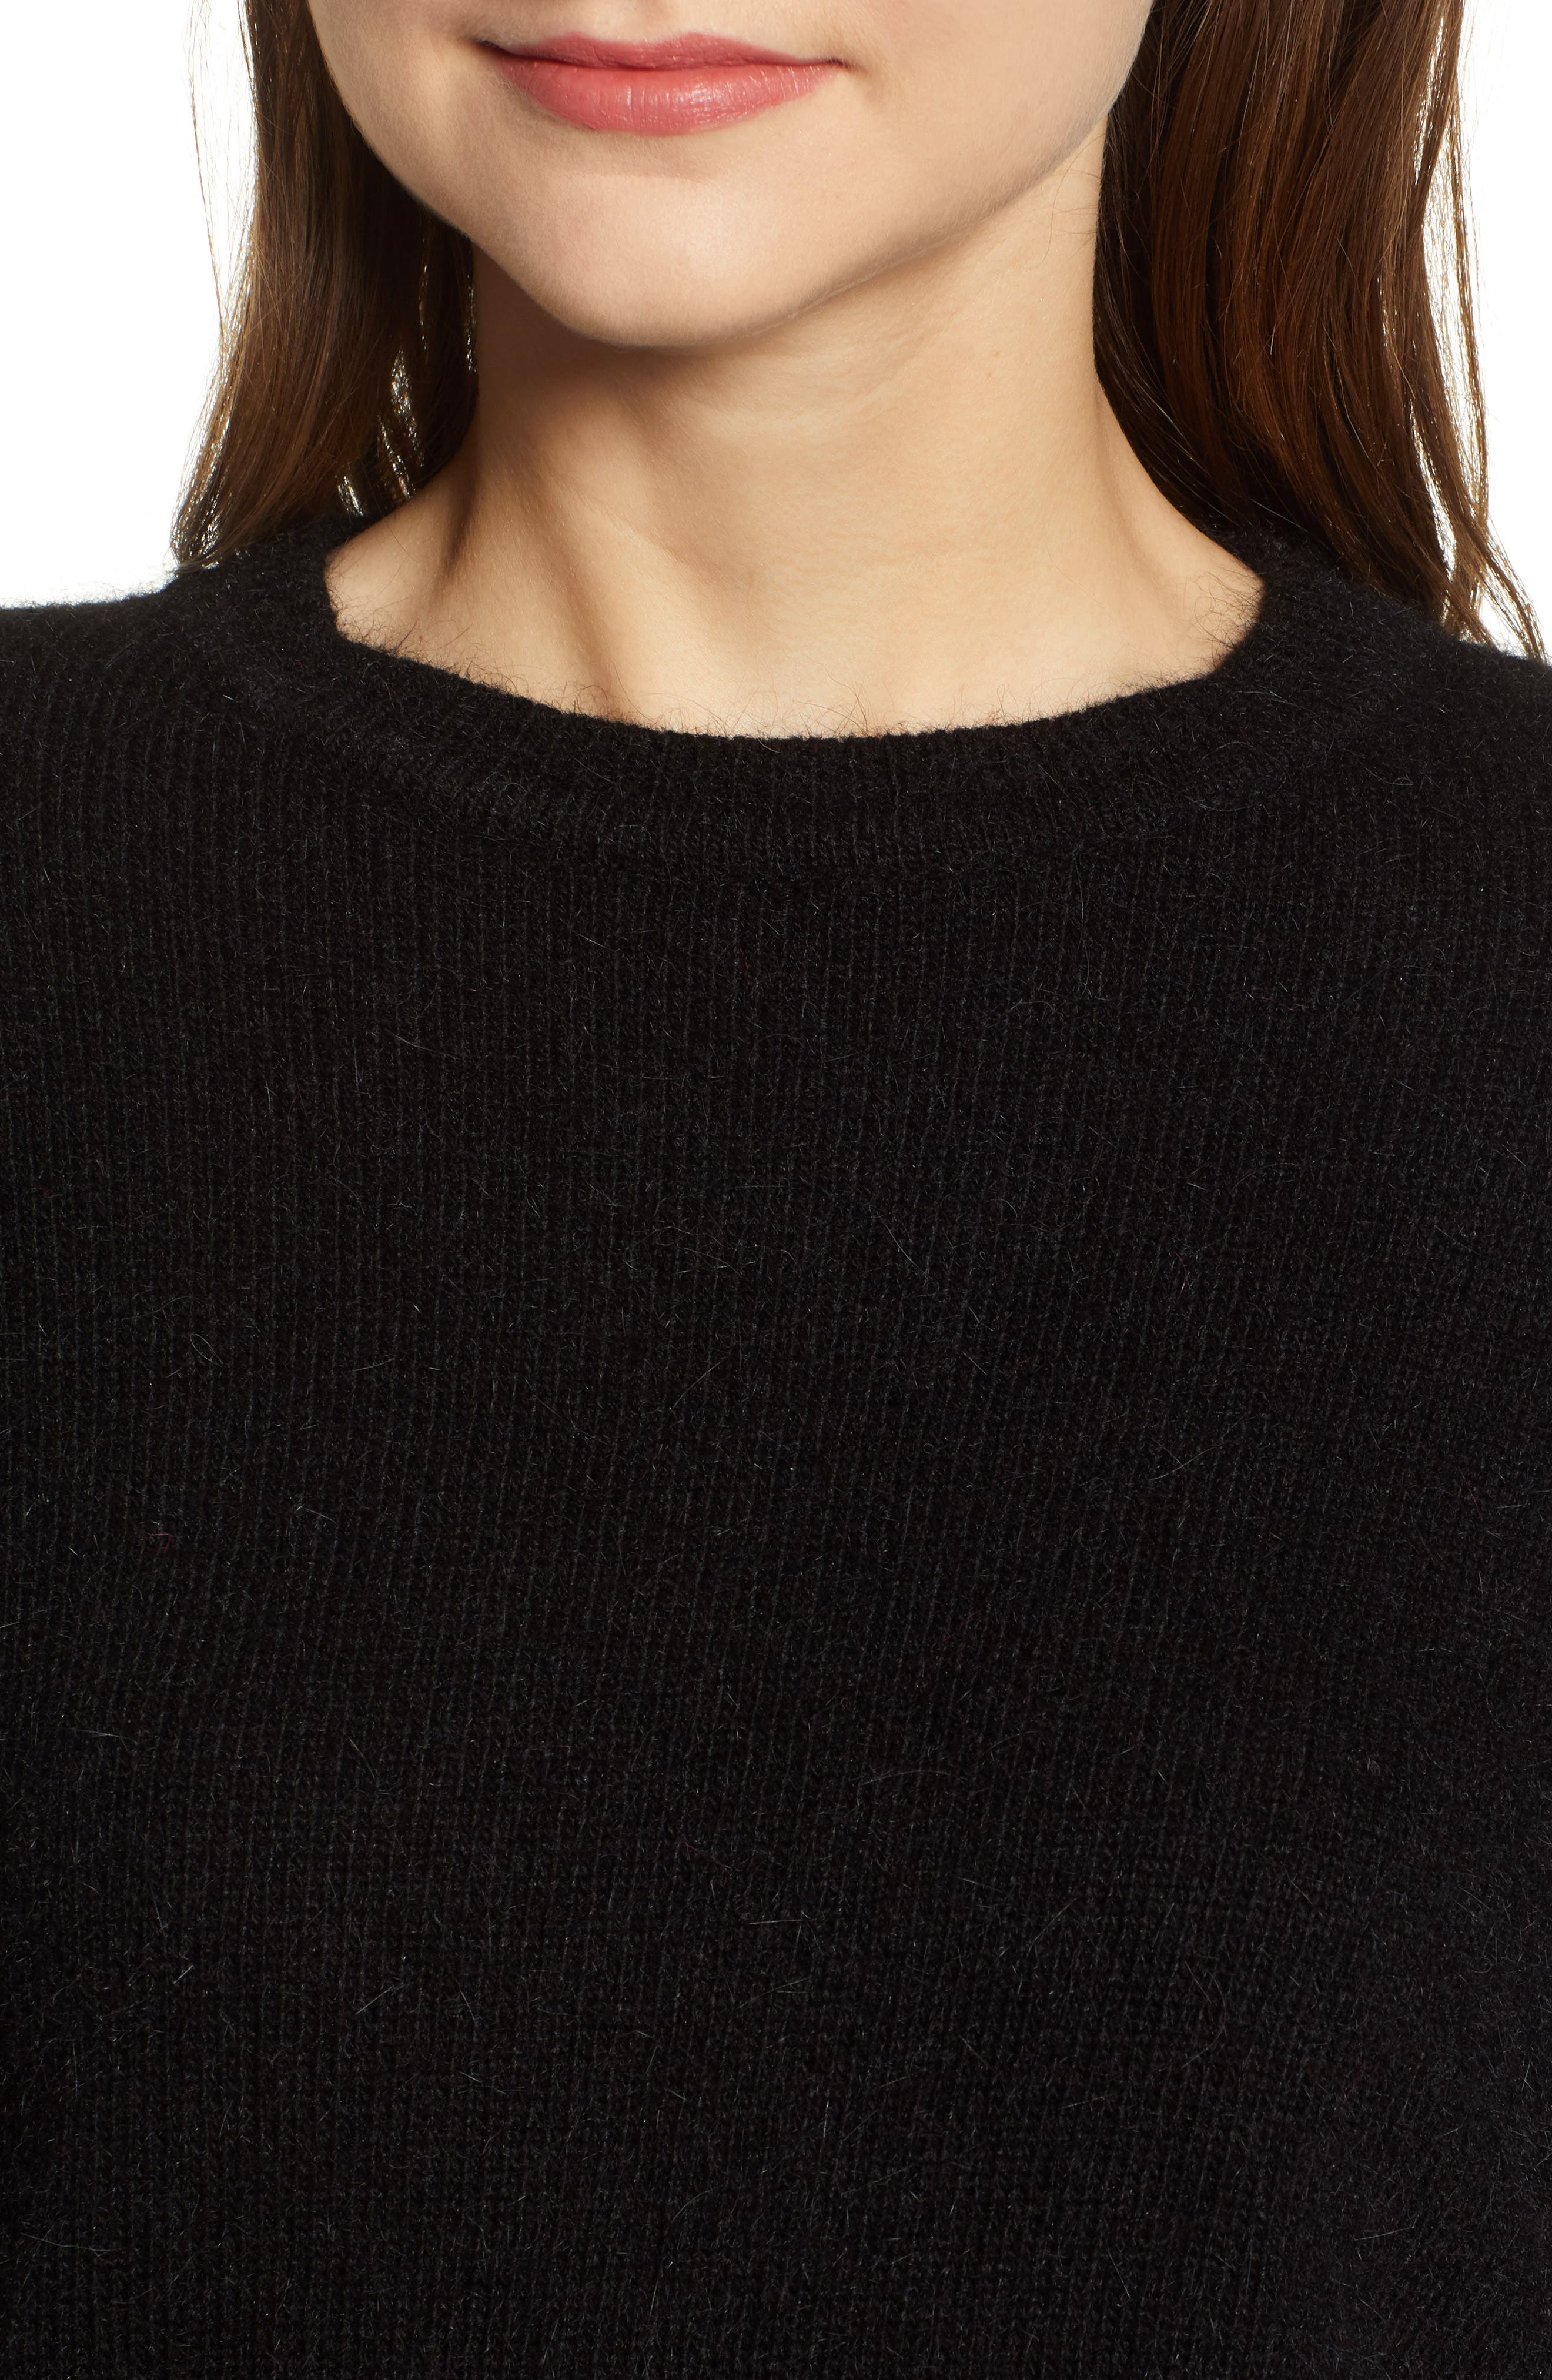 Blouson Sleeve Sweater,                             Alternate thumbnail 4, color,                             BLACK